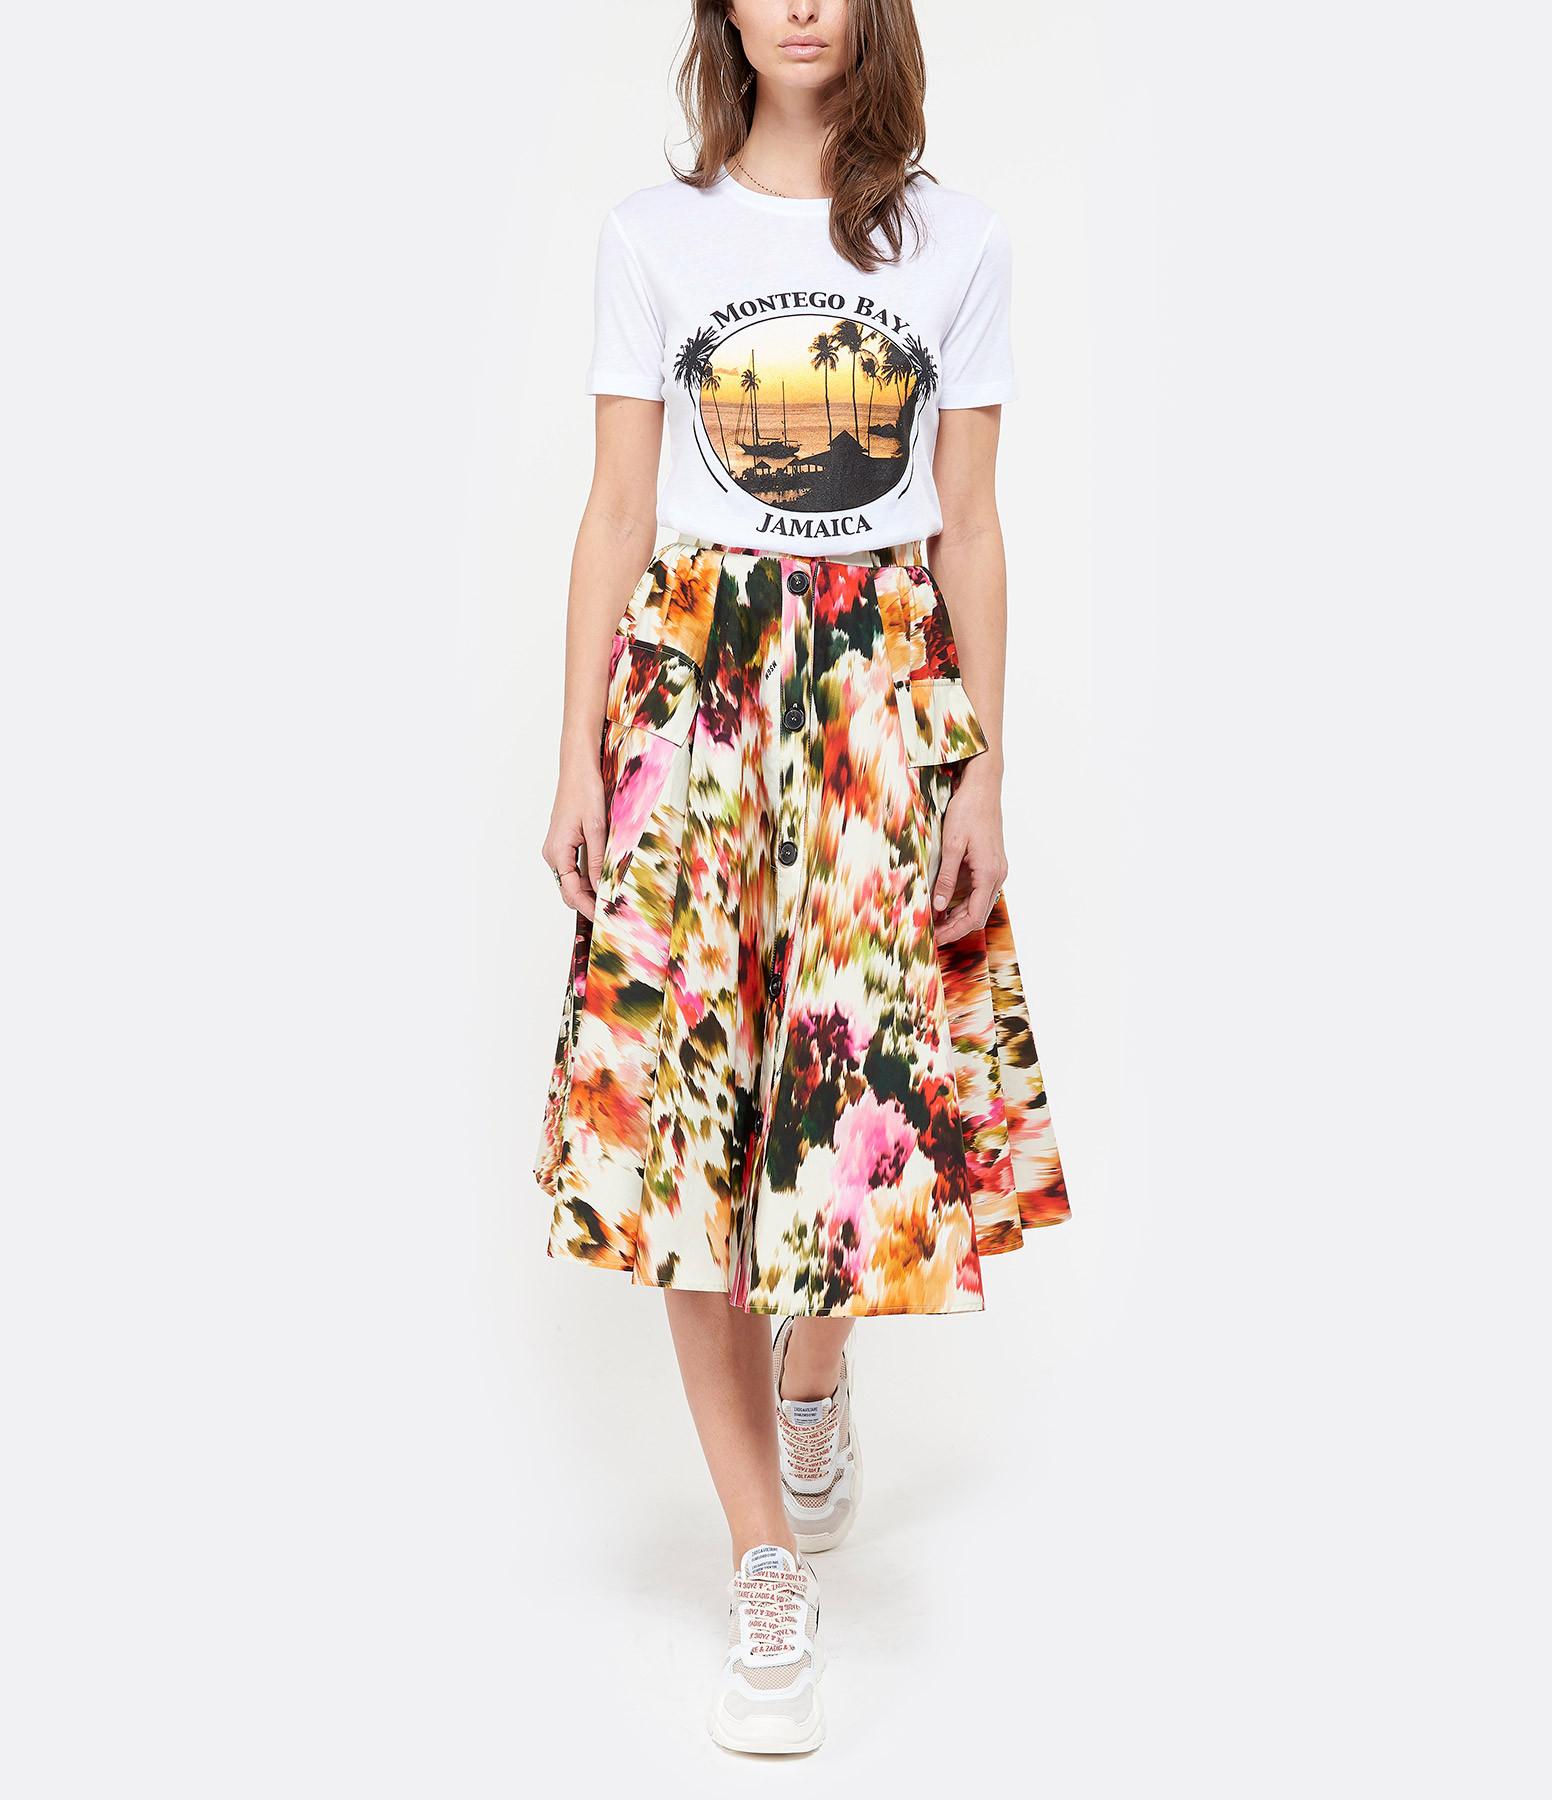 MSGM - Jupe Imprimé Floral Coton Ecru